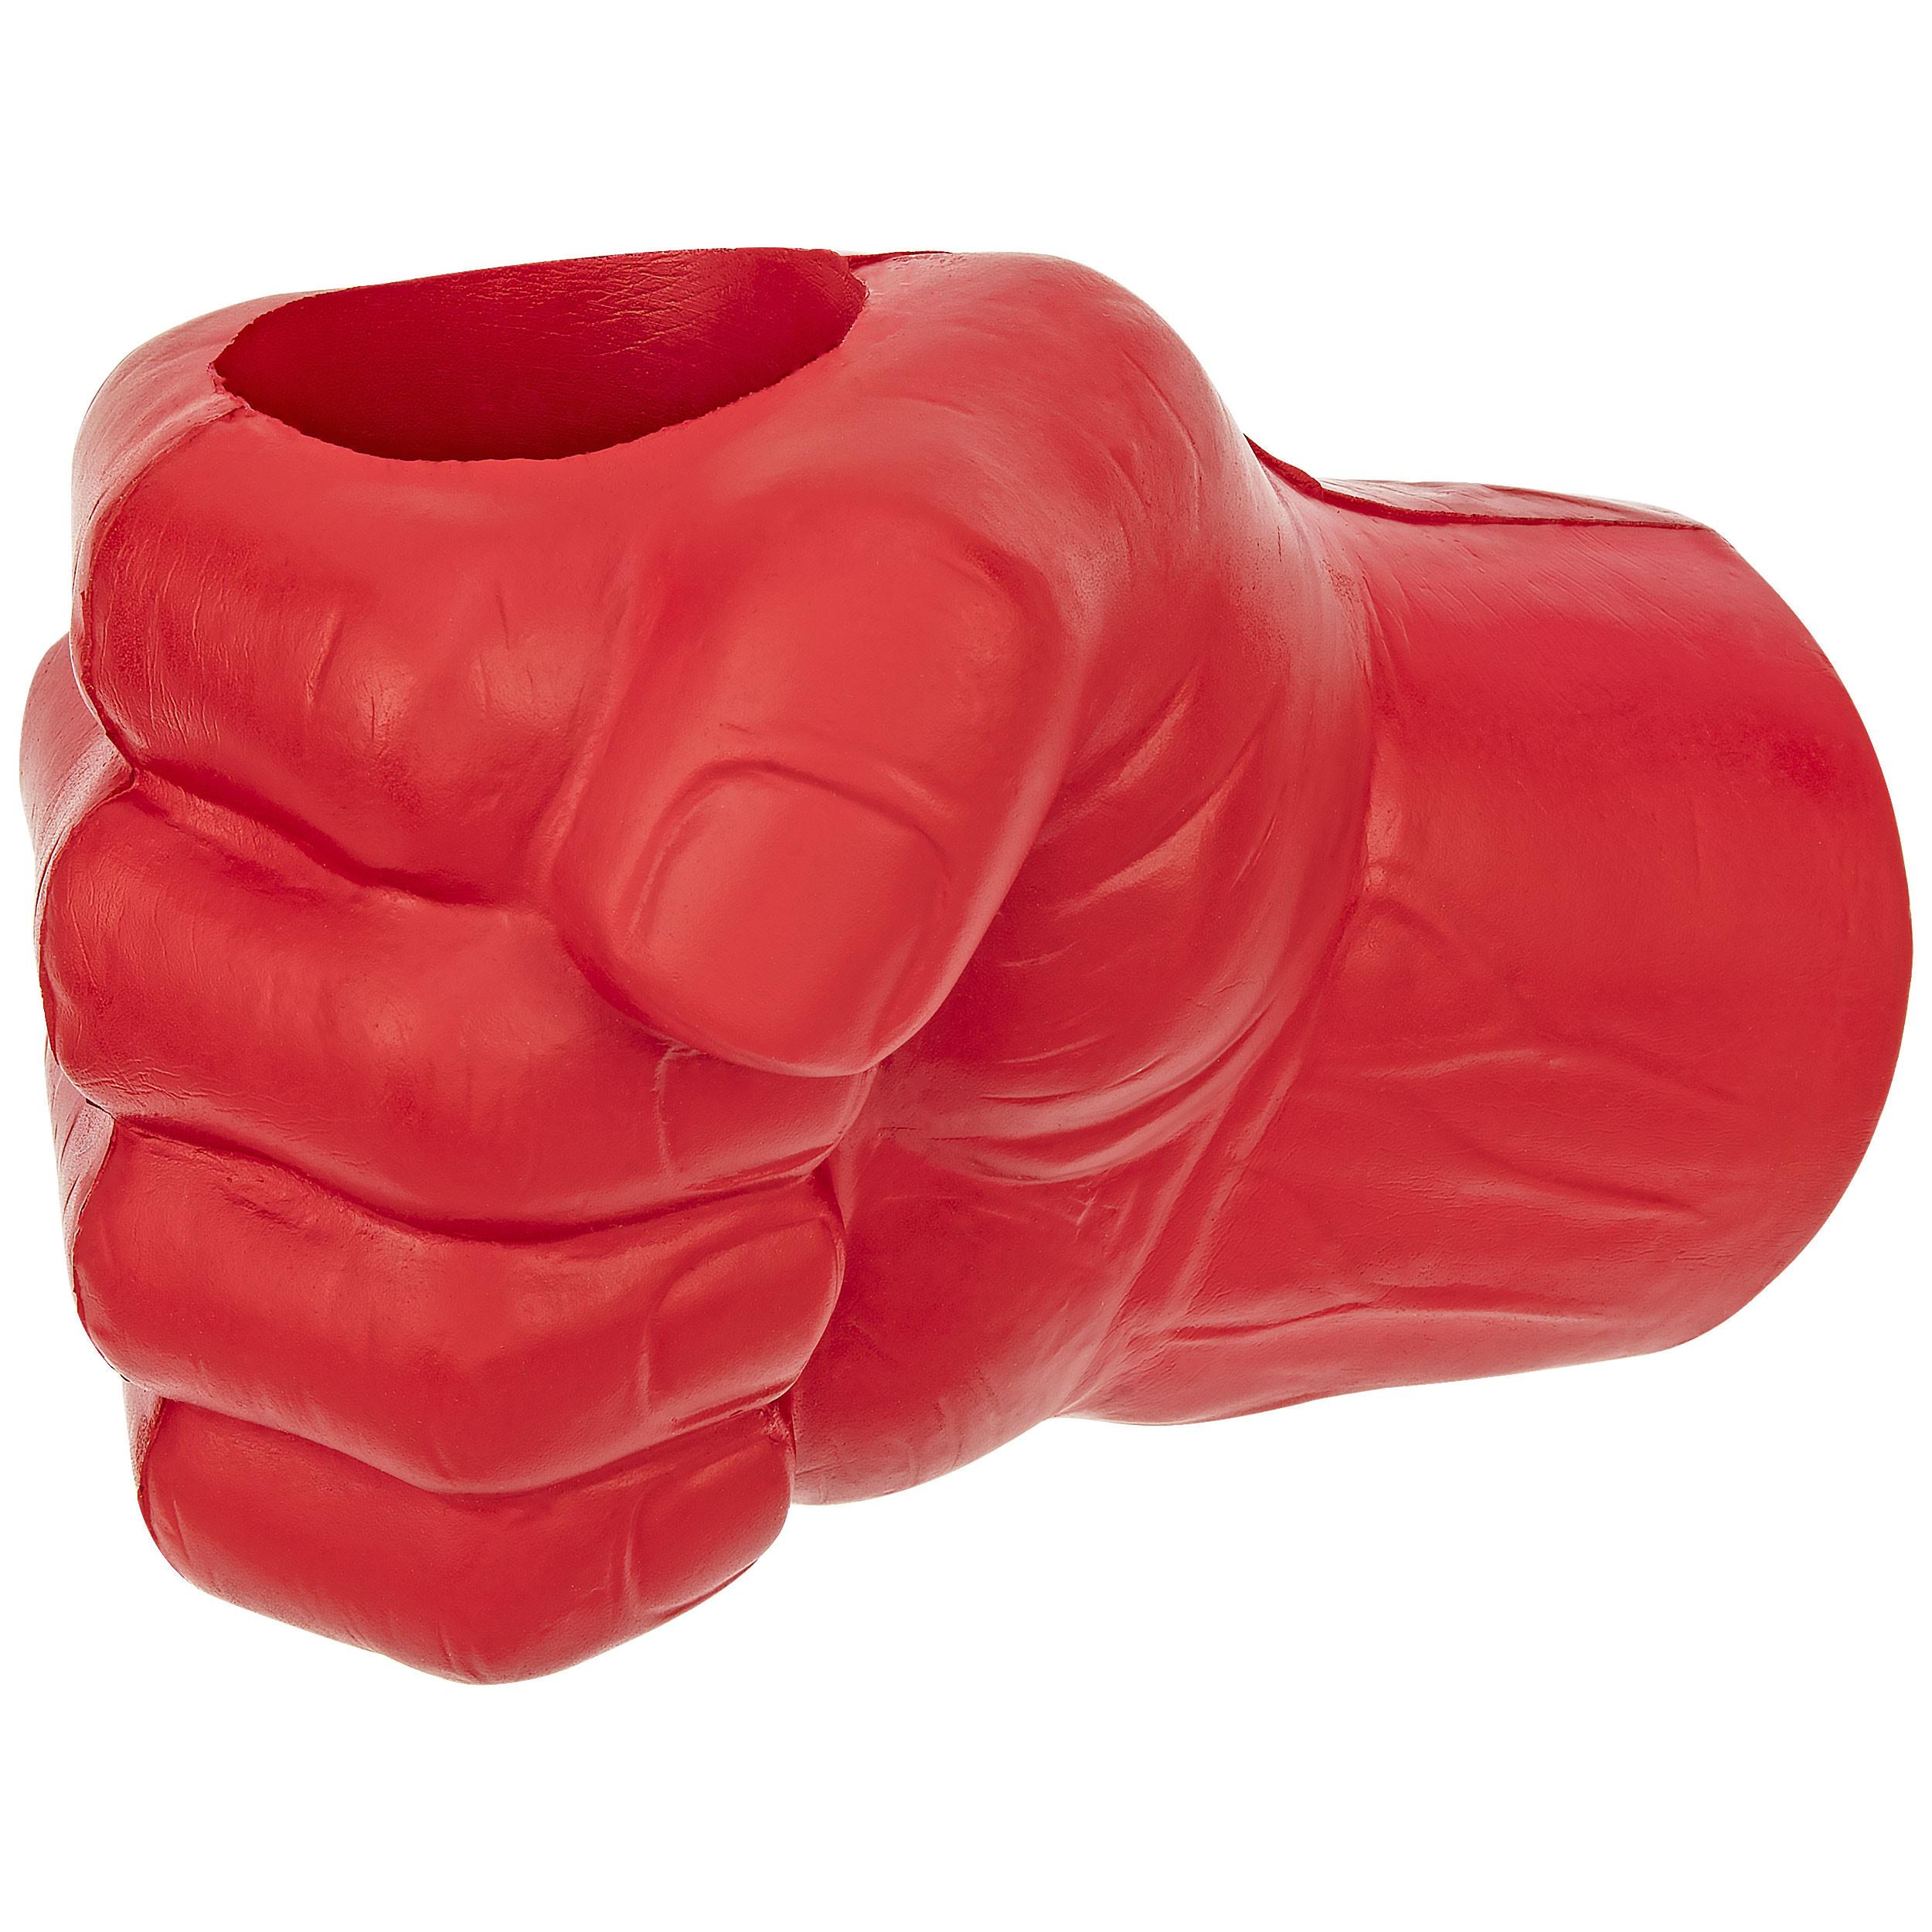 Fairly Odd Novelties Giant Foam Fist Hand Can Cooler Novelty, Right Hand, Red